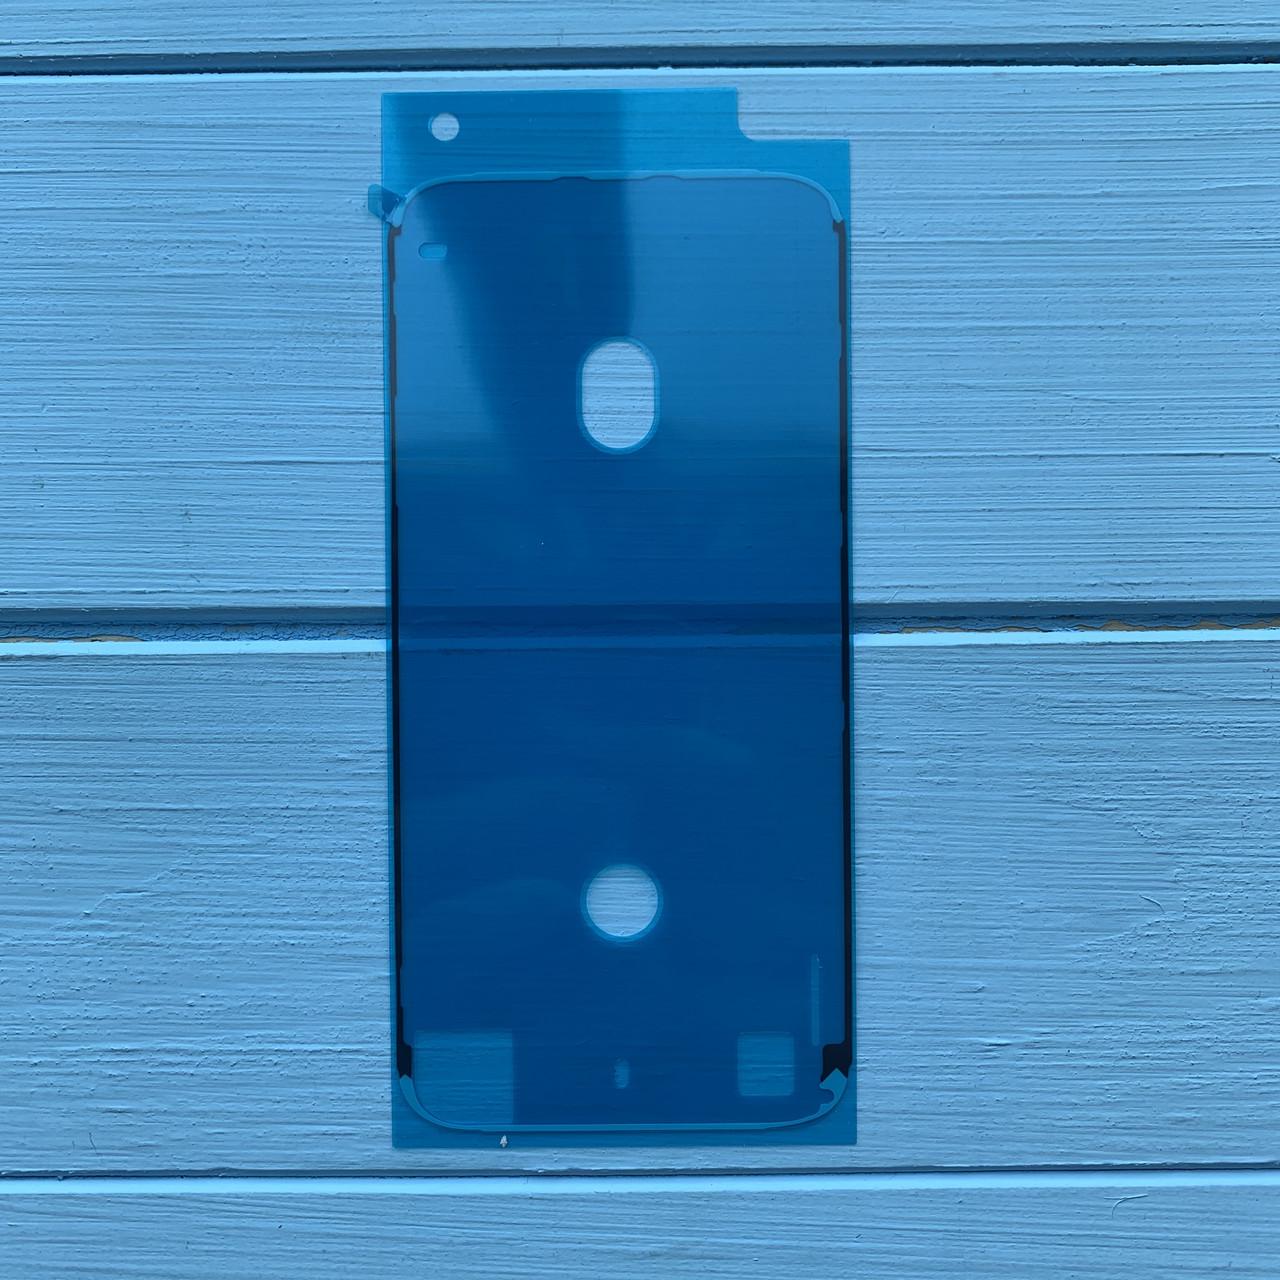 Стикер-проклейка (двухсторонний скотч) дисплея Apple iPhone 8 White